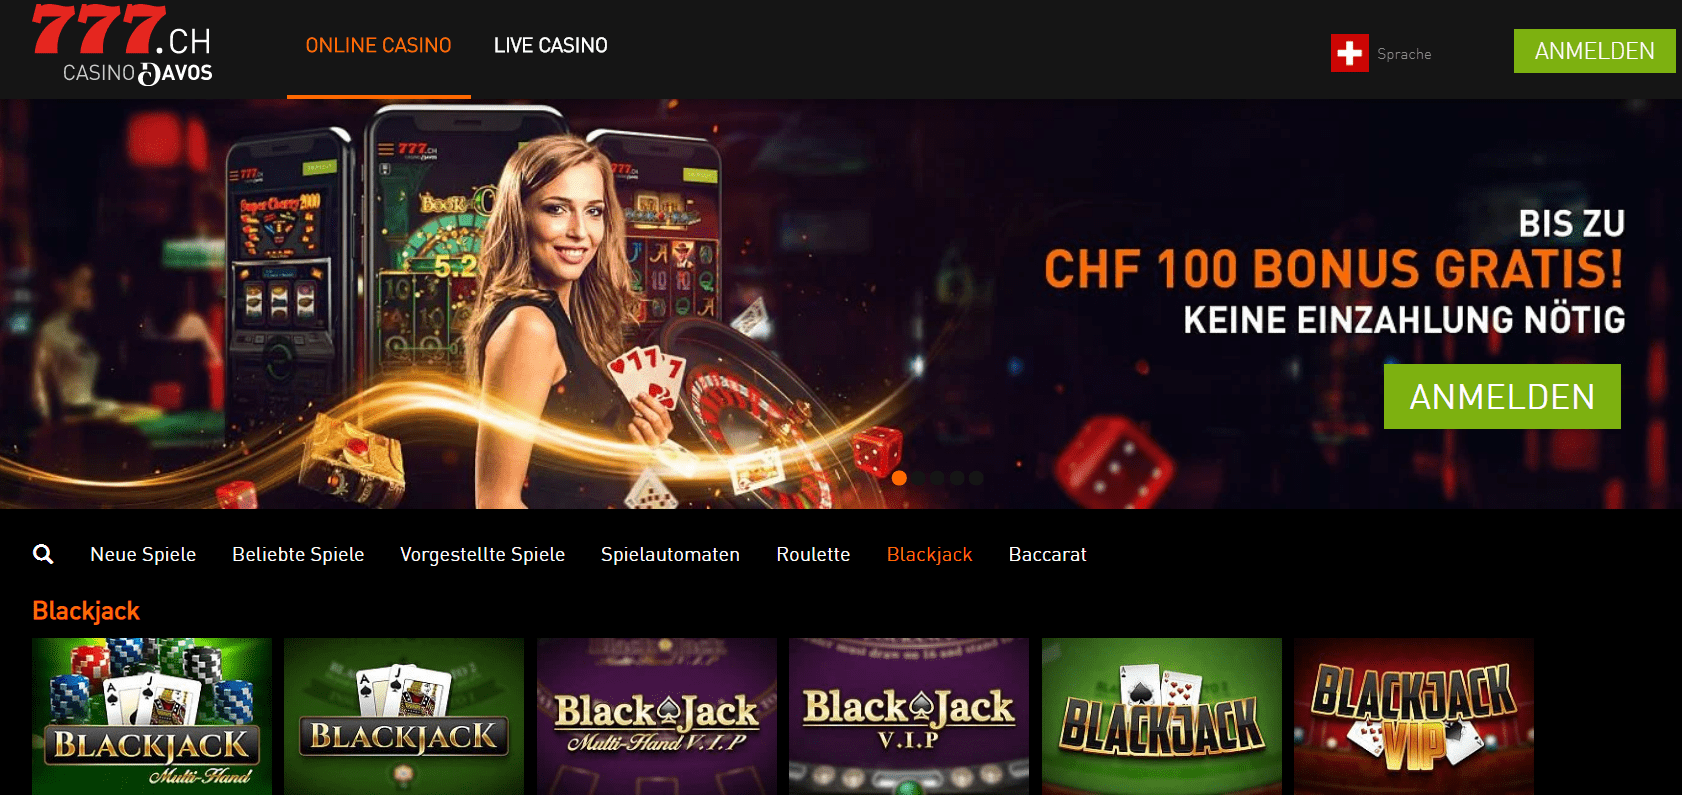 Casino777 ch blackjack